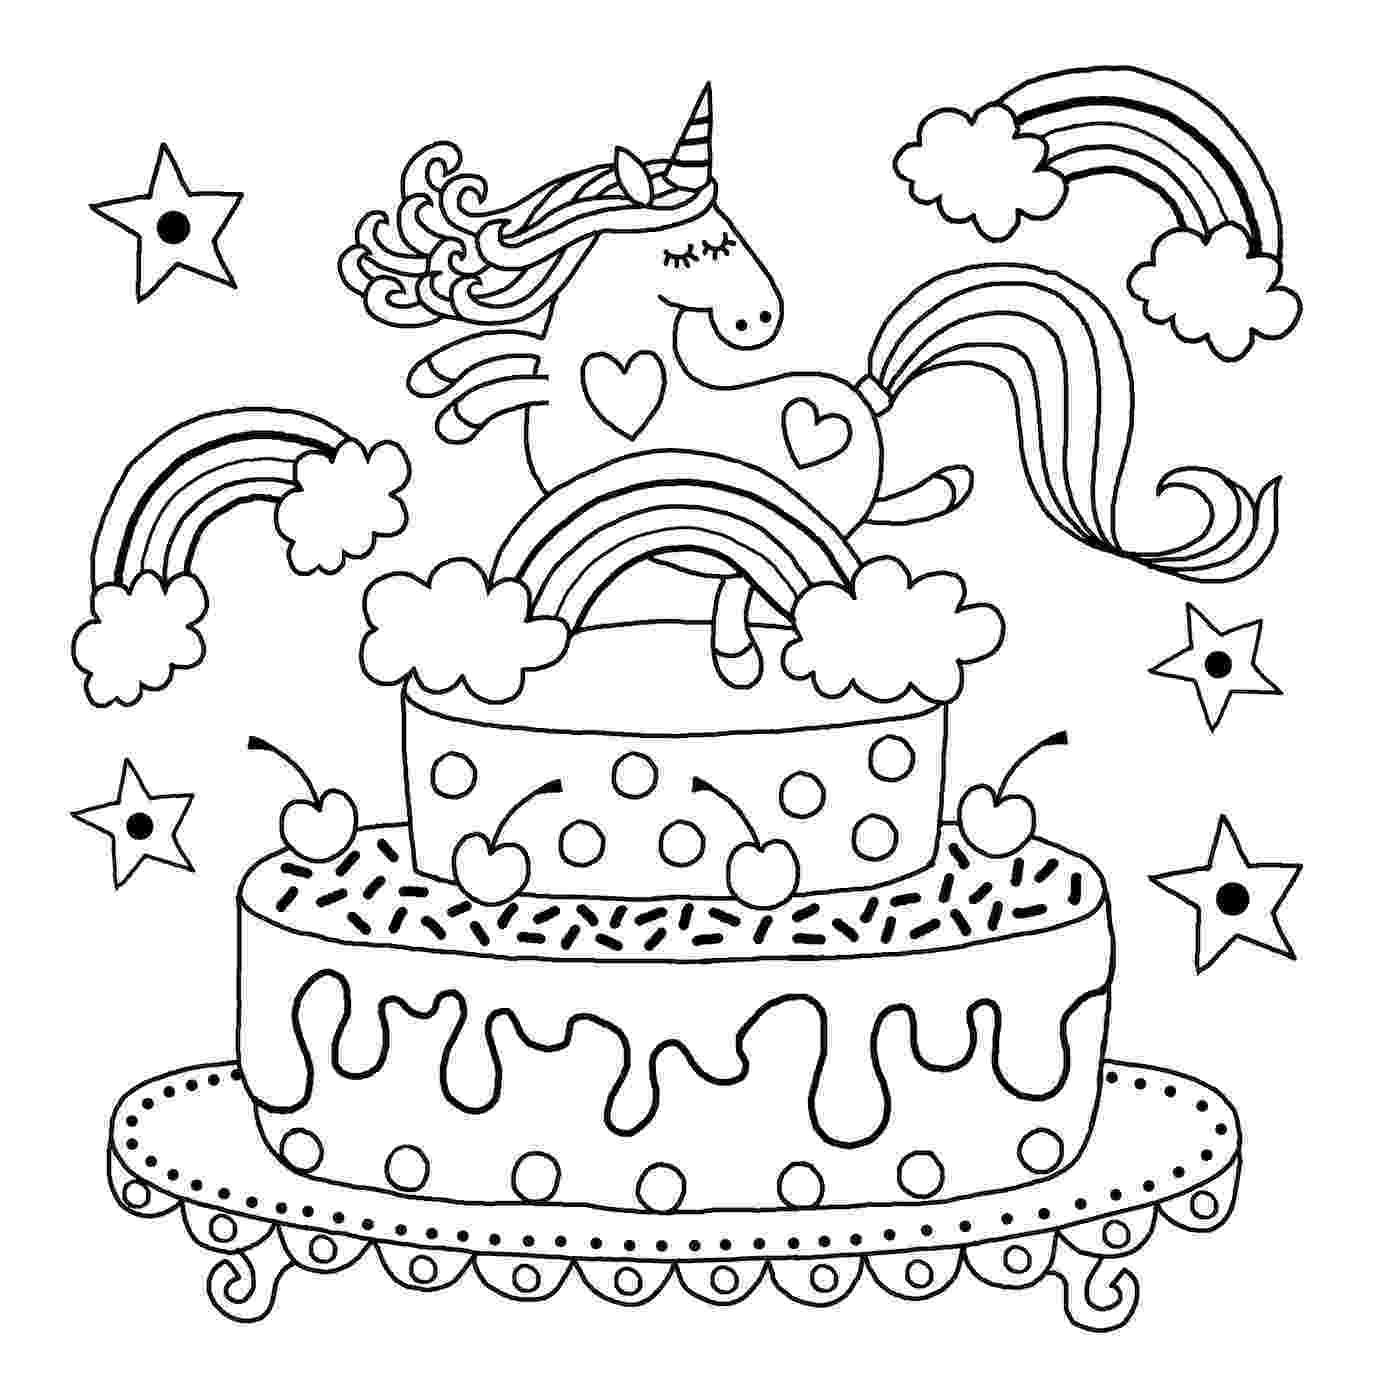 coloring pages unicorns rainbows unicorn rainbow coloring pages coloring home coloring rainbows pages unicorns 1 1